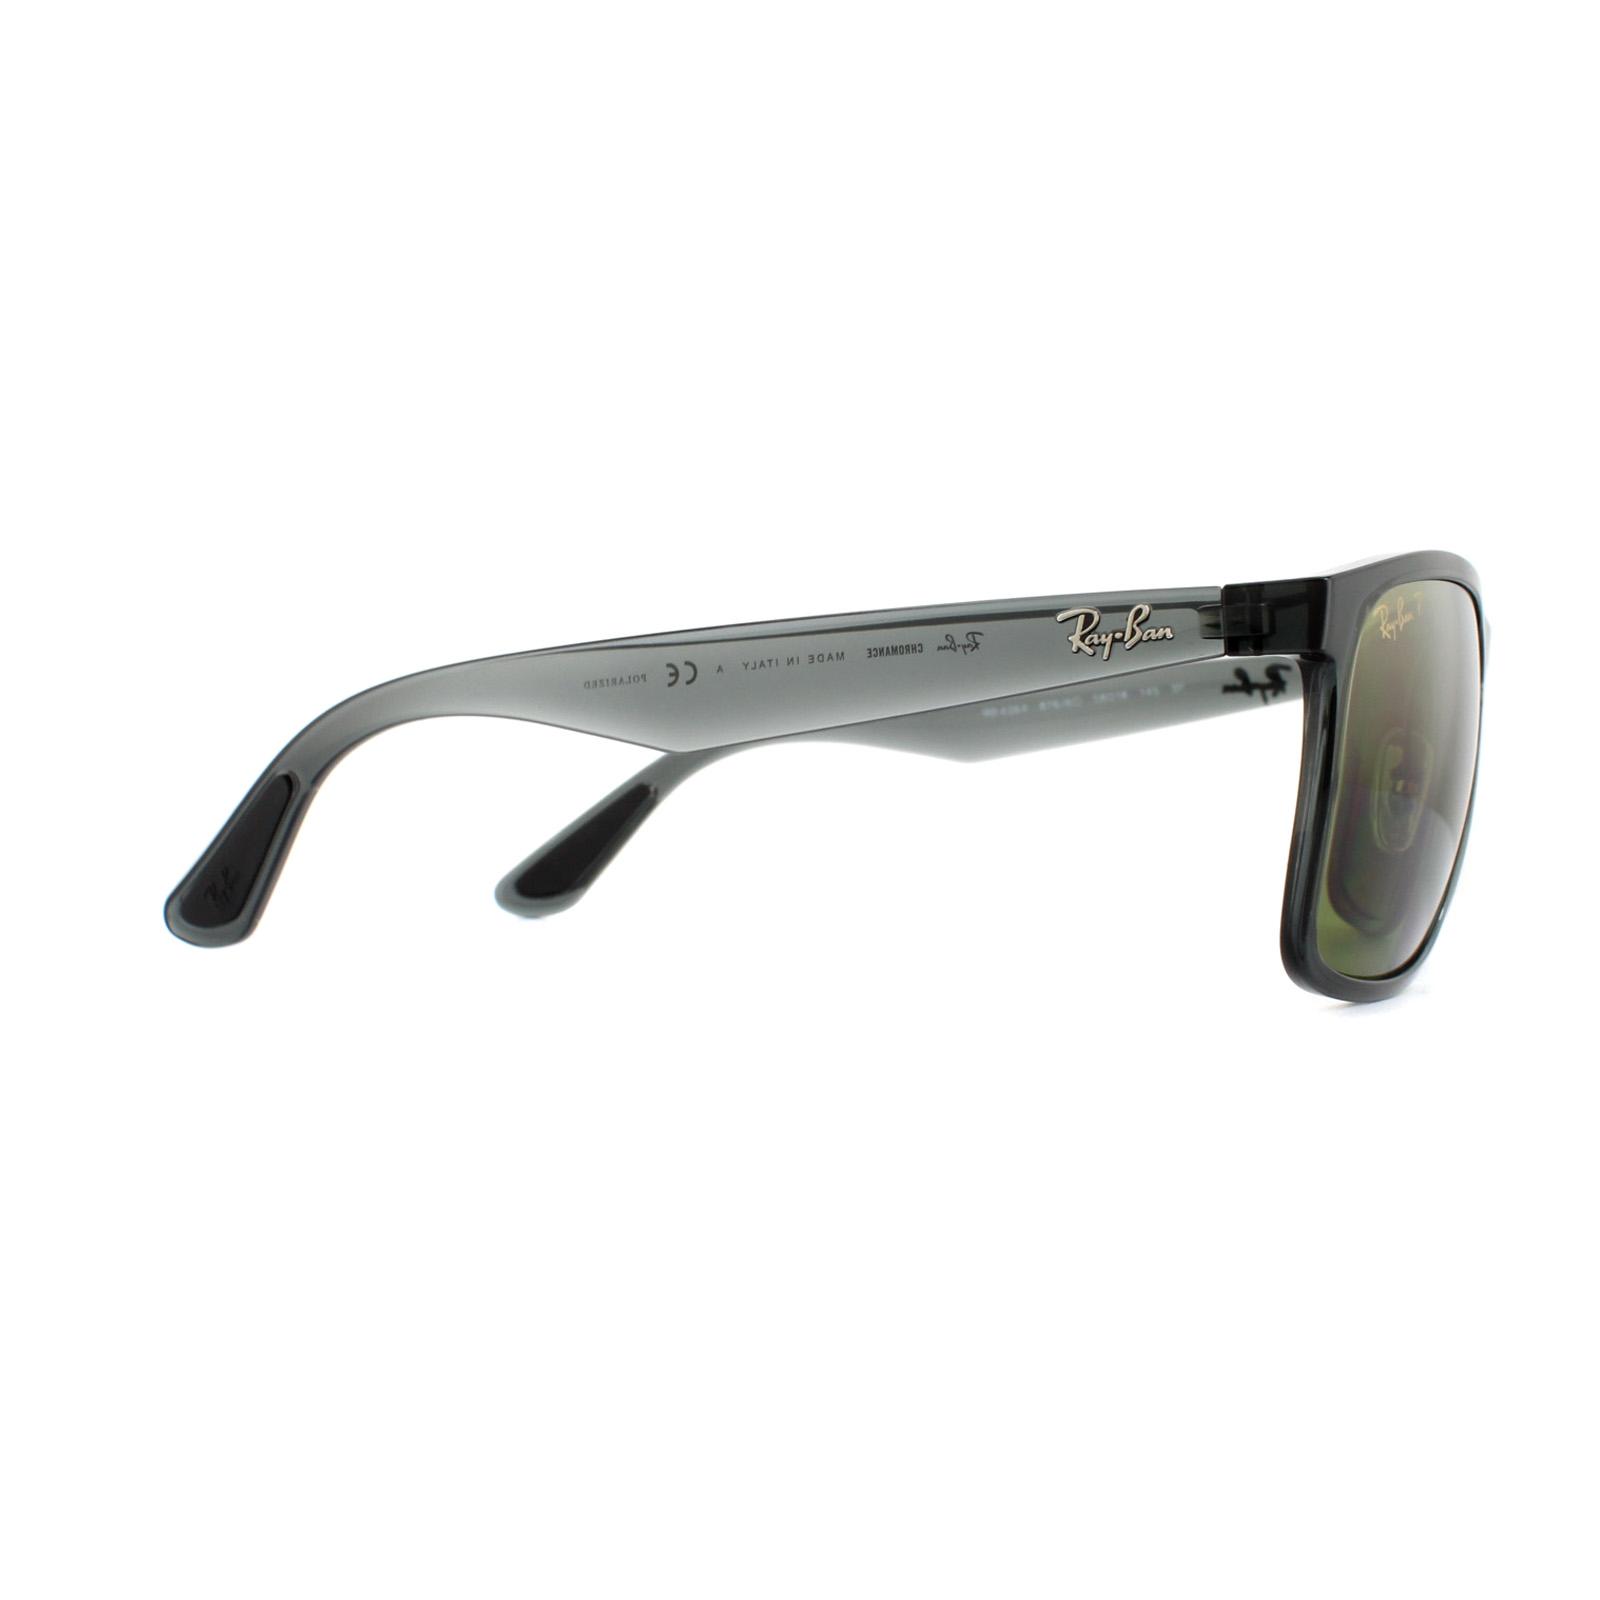 cf70bff83 Sentinel Ray-Ban Sunglasses RB4264 876/6O Shiny Grey Green Polarized Mirror  Chromance